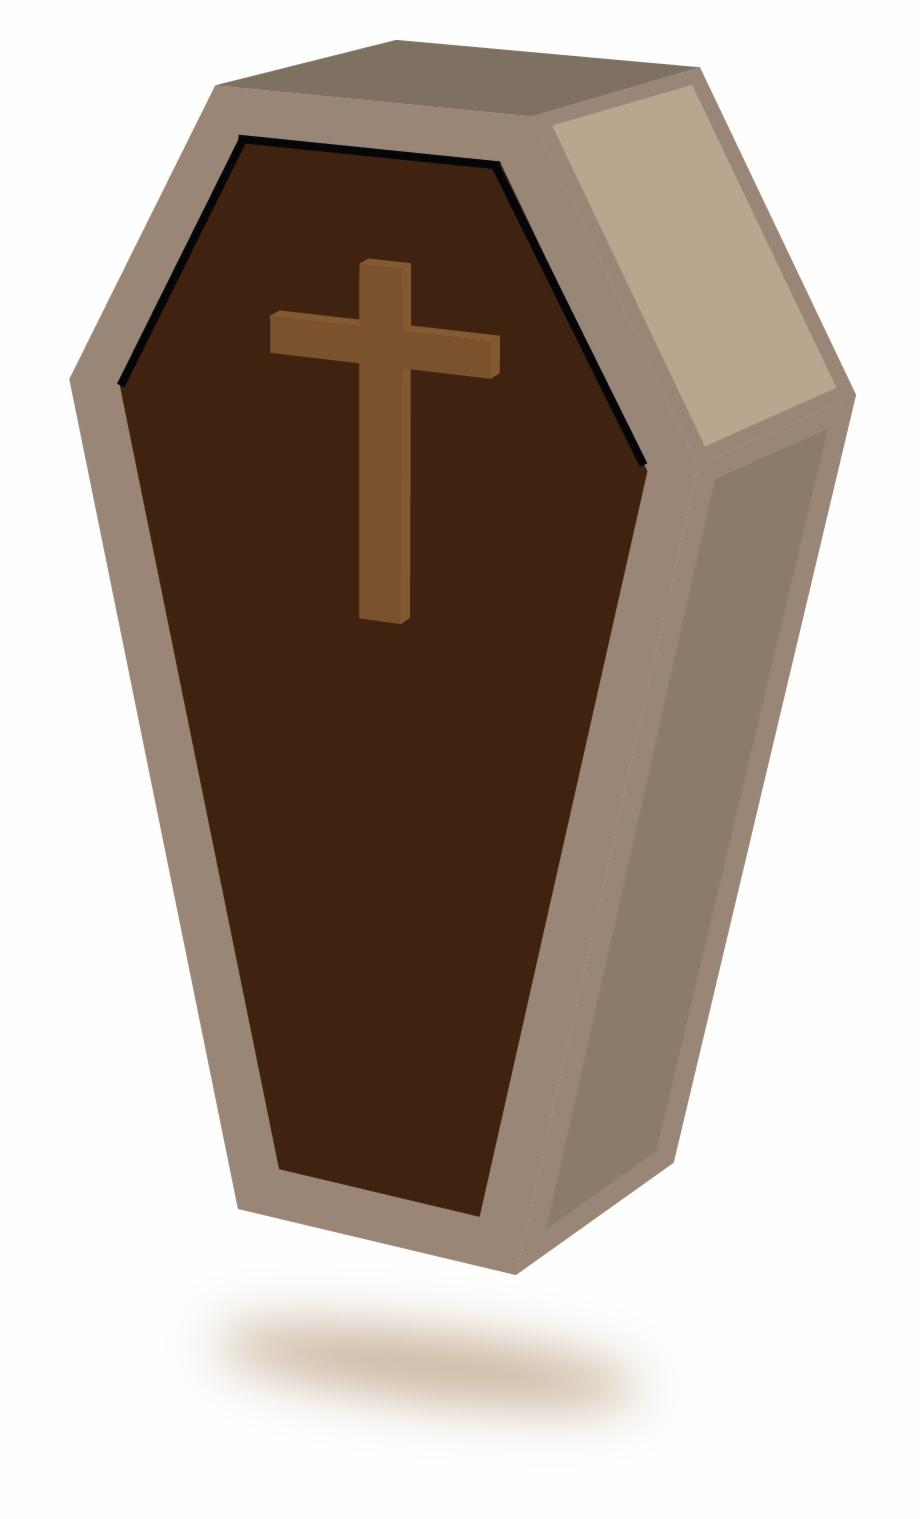 Coffin Clipart Brown.